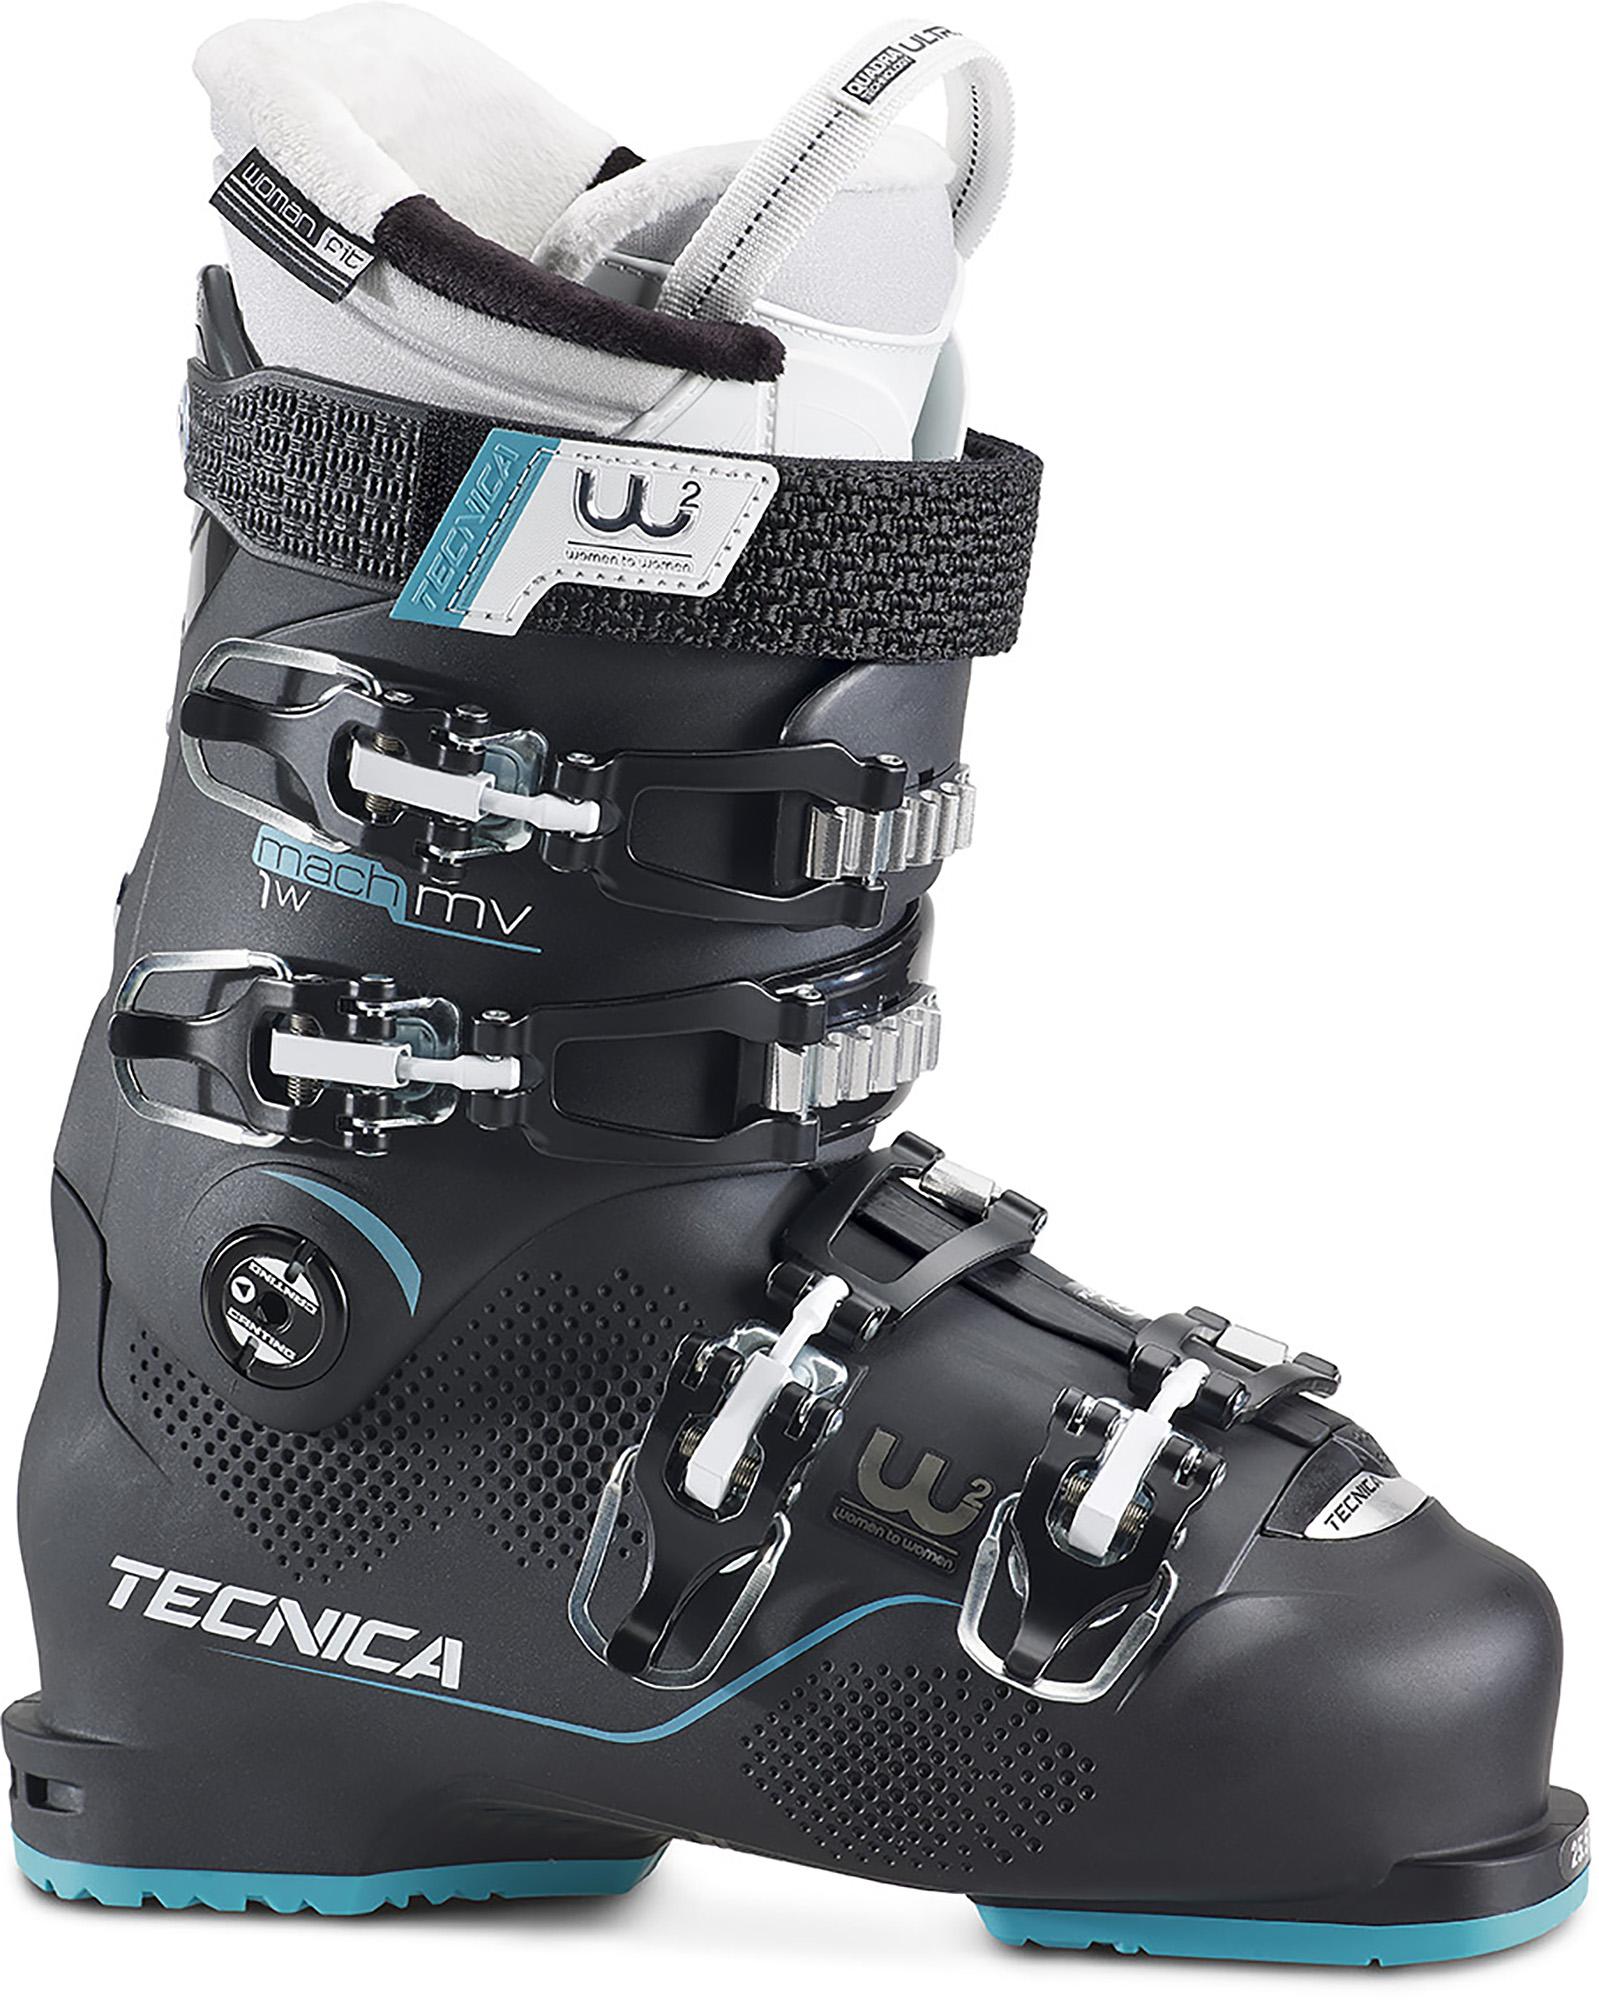 Tecnica Ботинки горнолыжные женские Mach1 85 W MV EU, размер 40,5